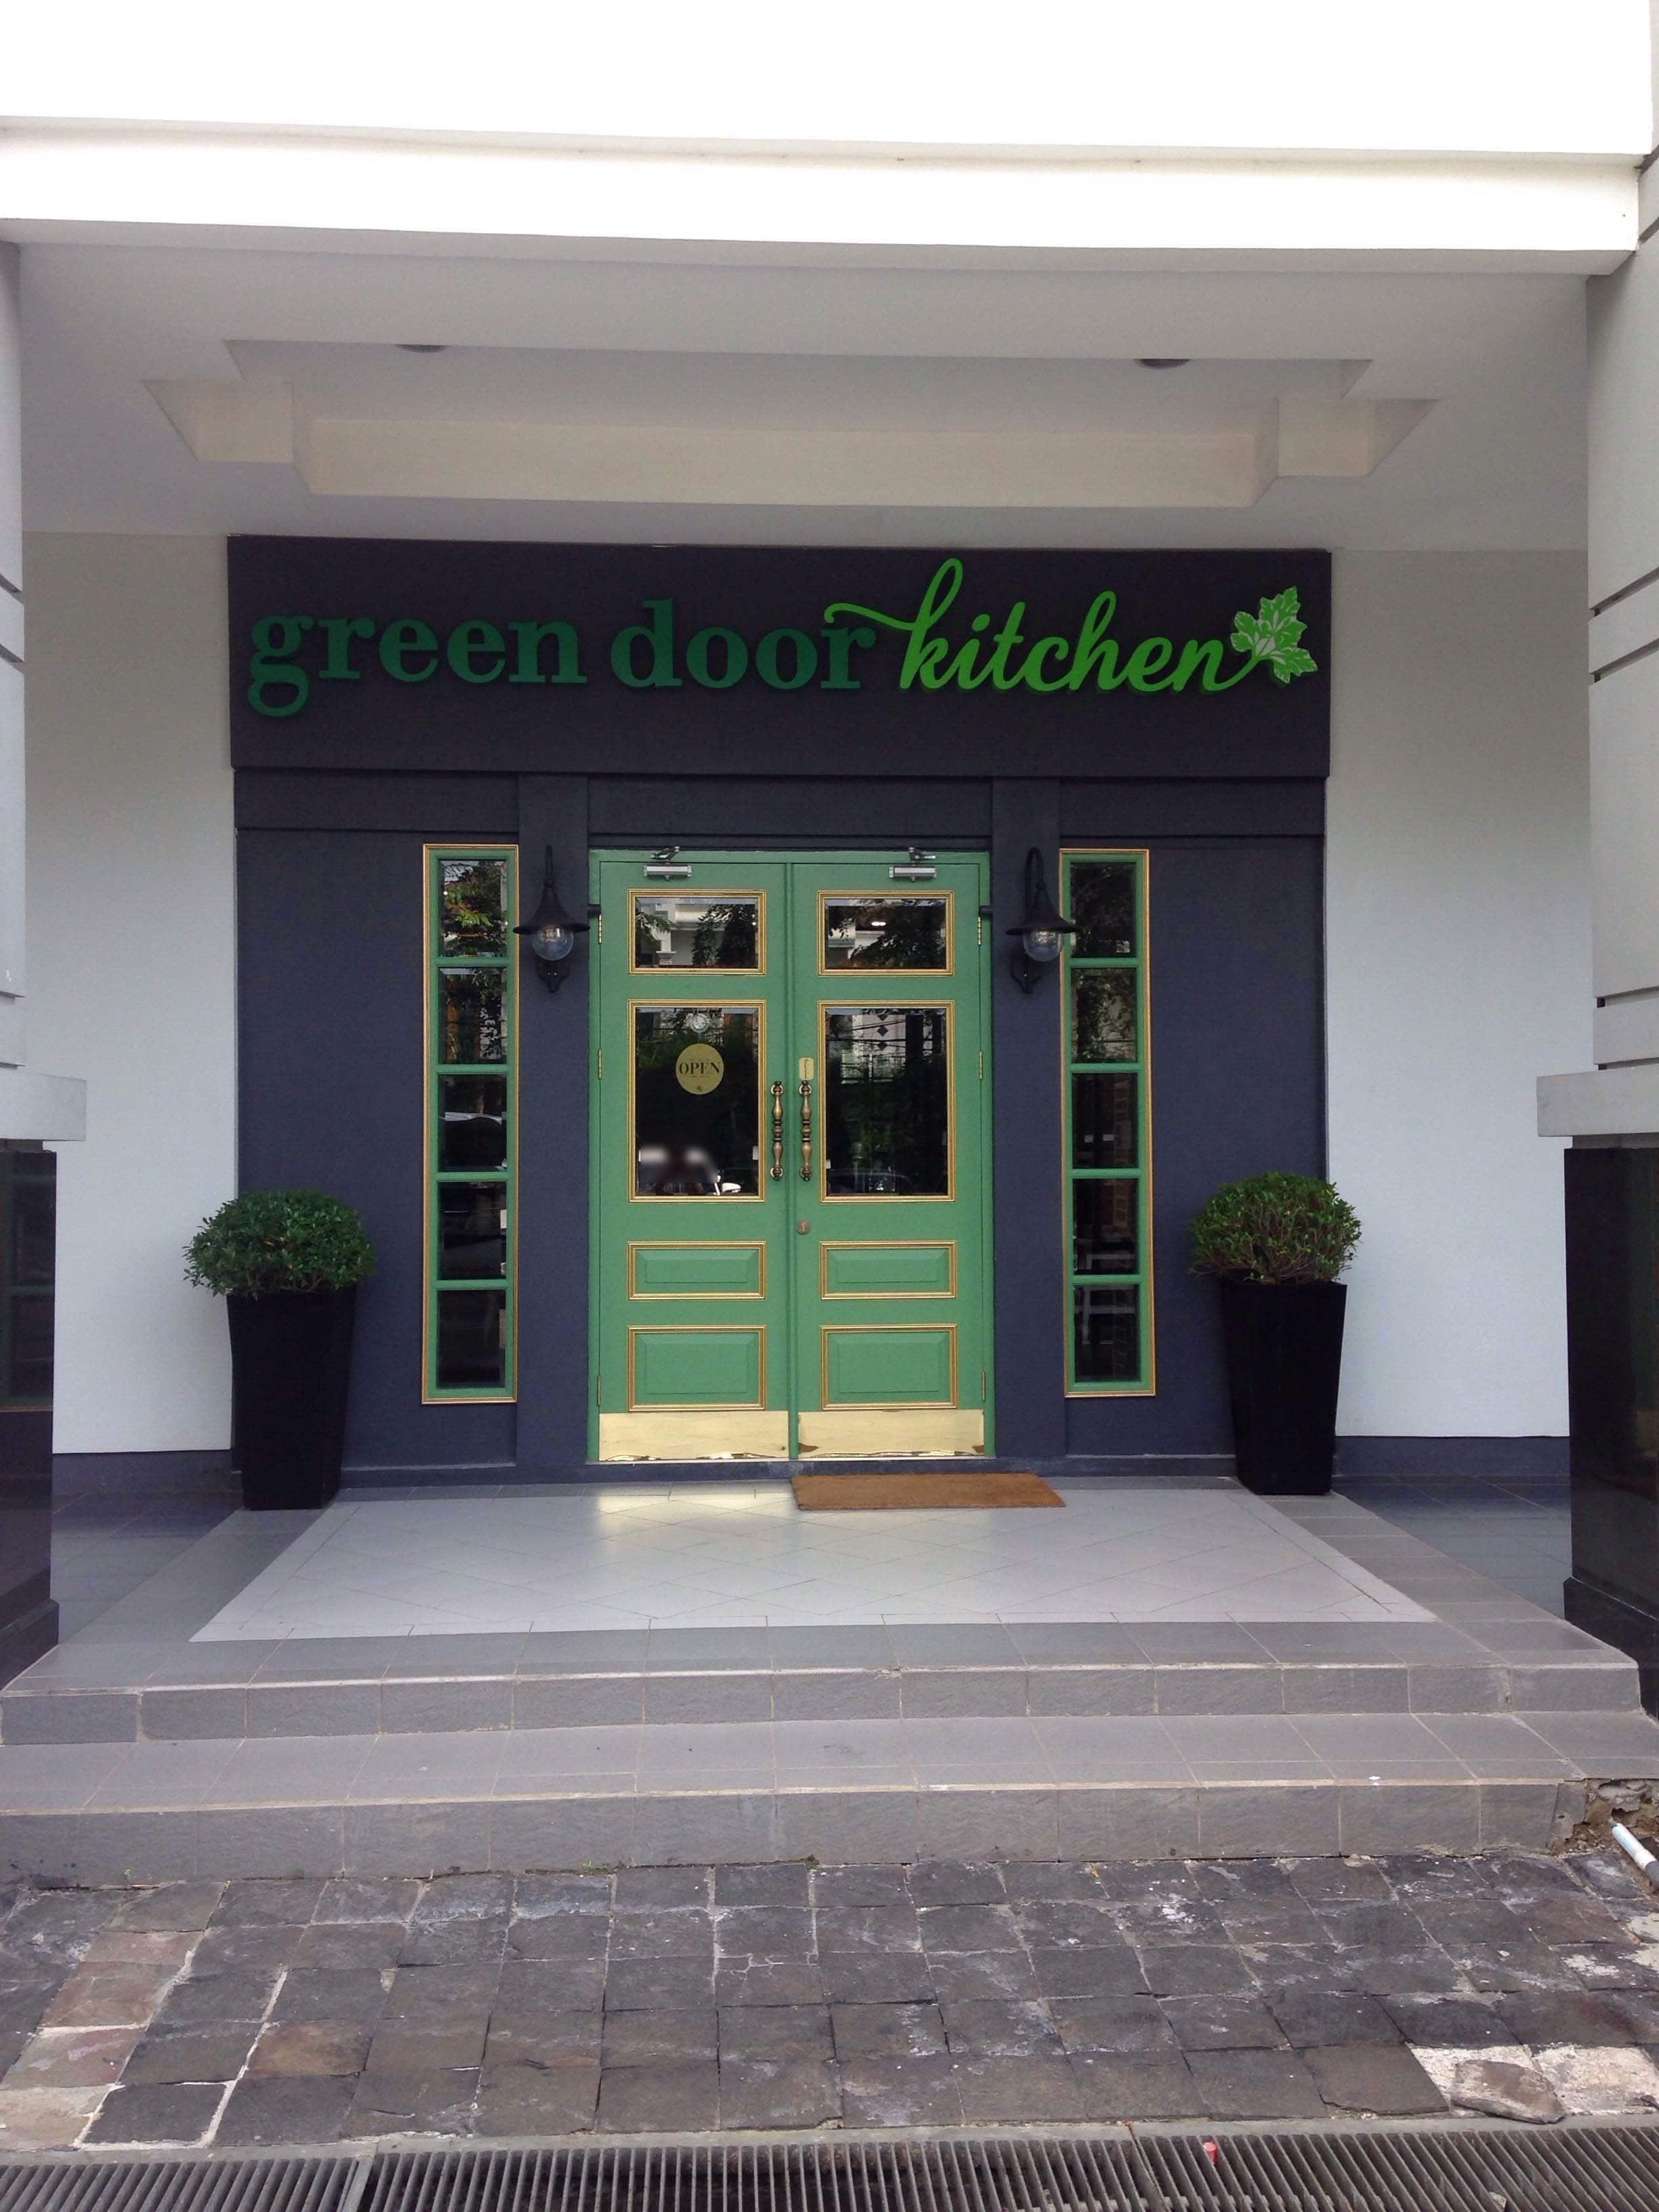 Green Door Kitchen Kelapa Gading Photos & Green Door Kitchen Kelapa Gading Jakarta - Zomato Indonesia